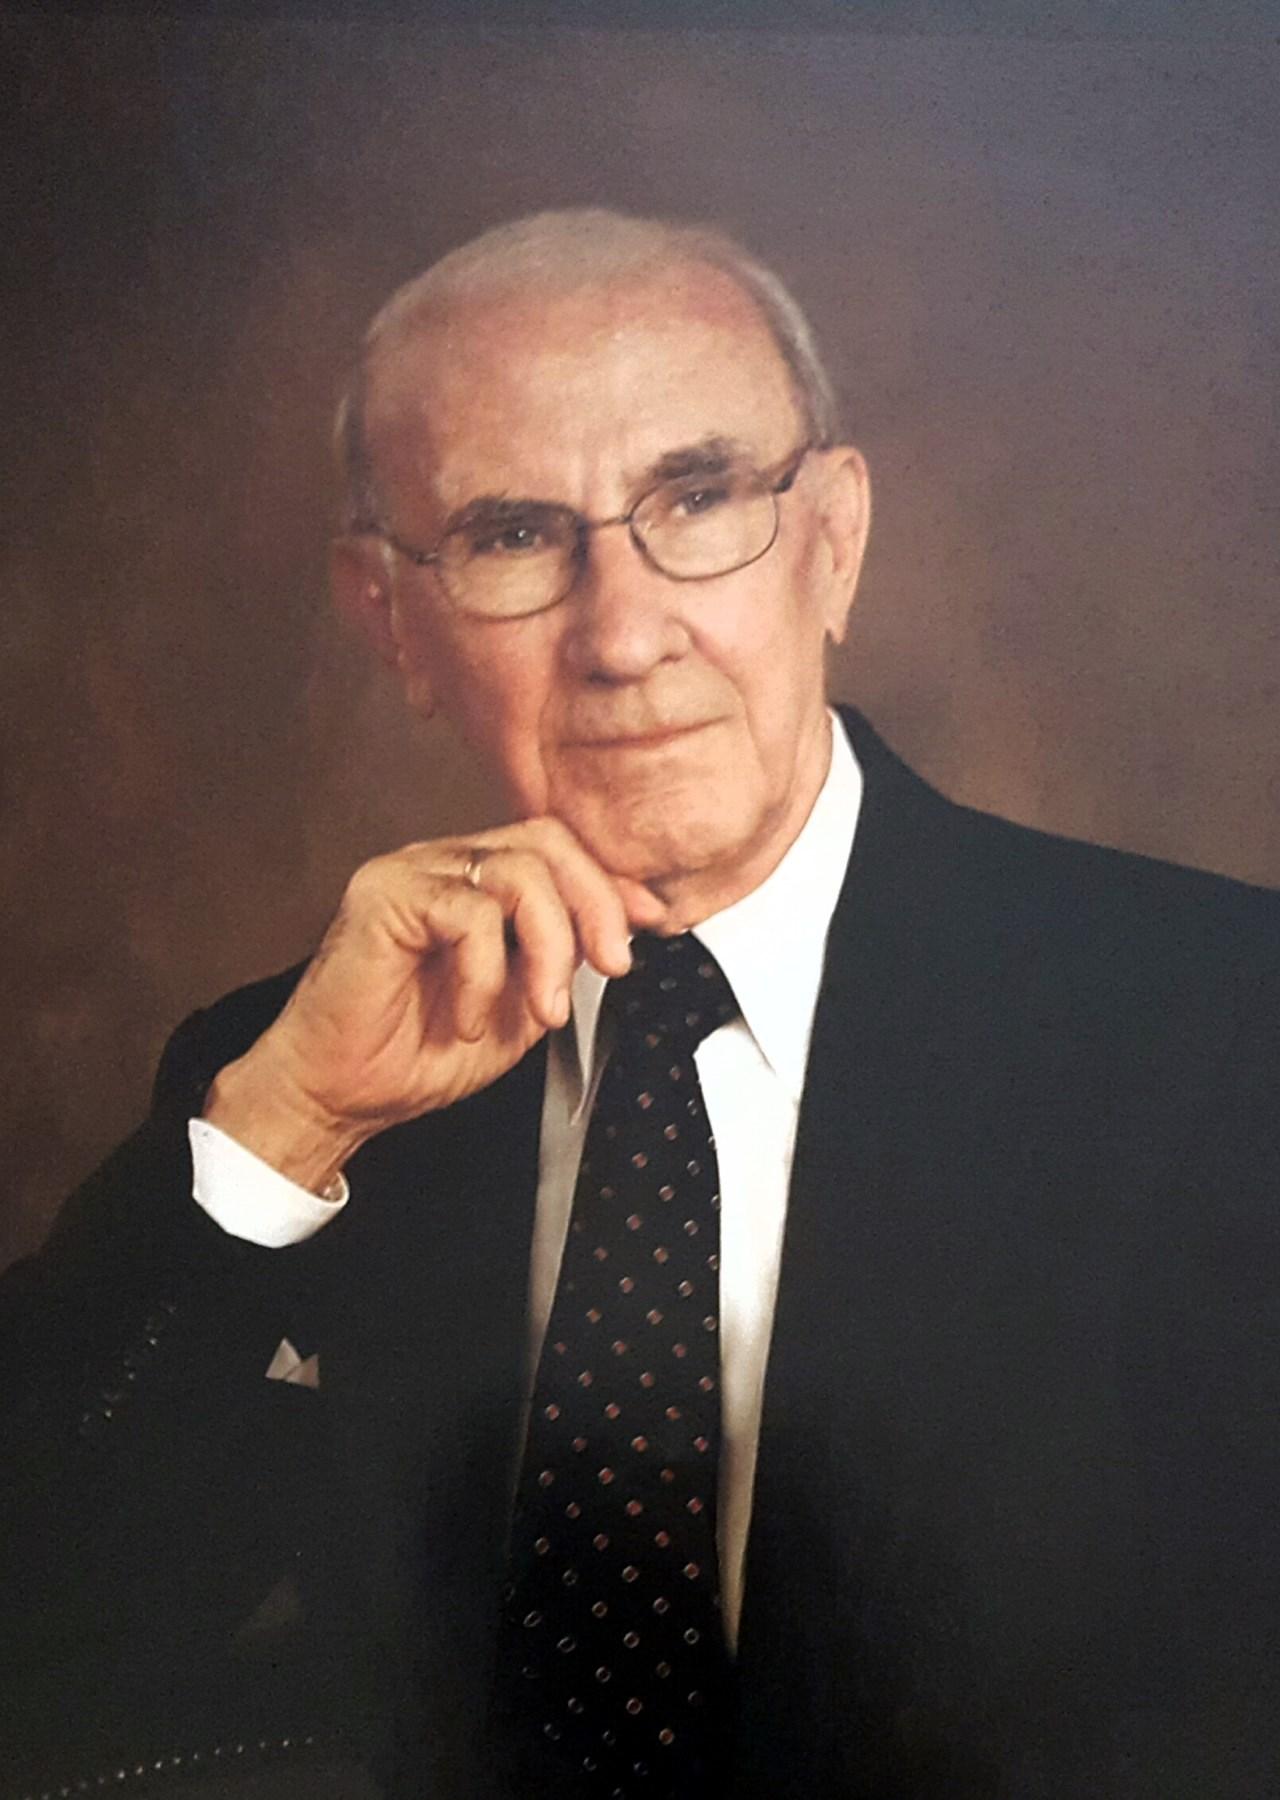 H.  Wayne  Luquer